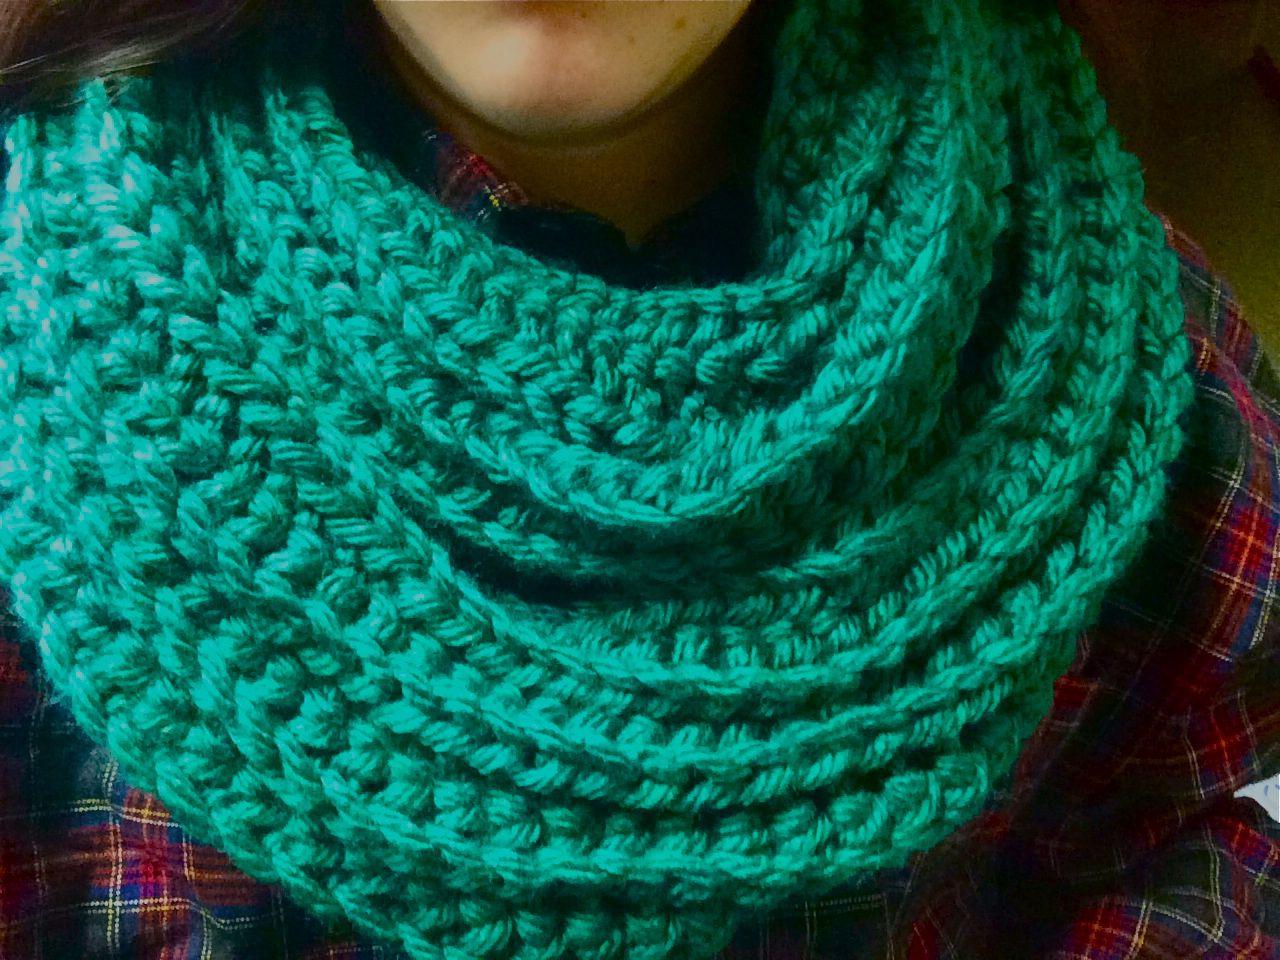 Single Crochet Scarf | www.imgkid.com - The Image Kid Has It!